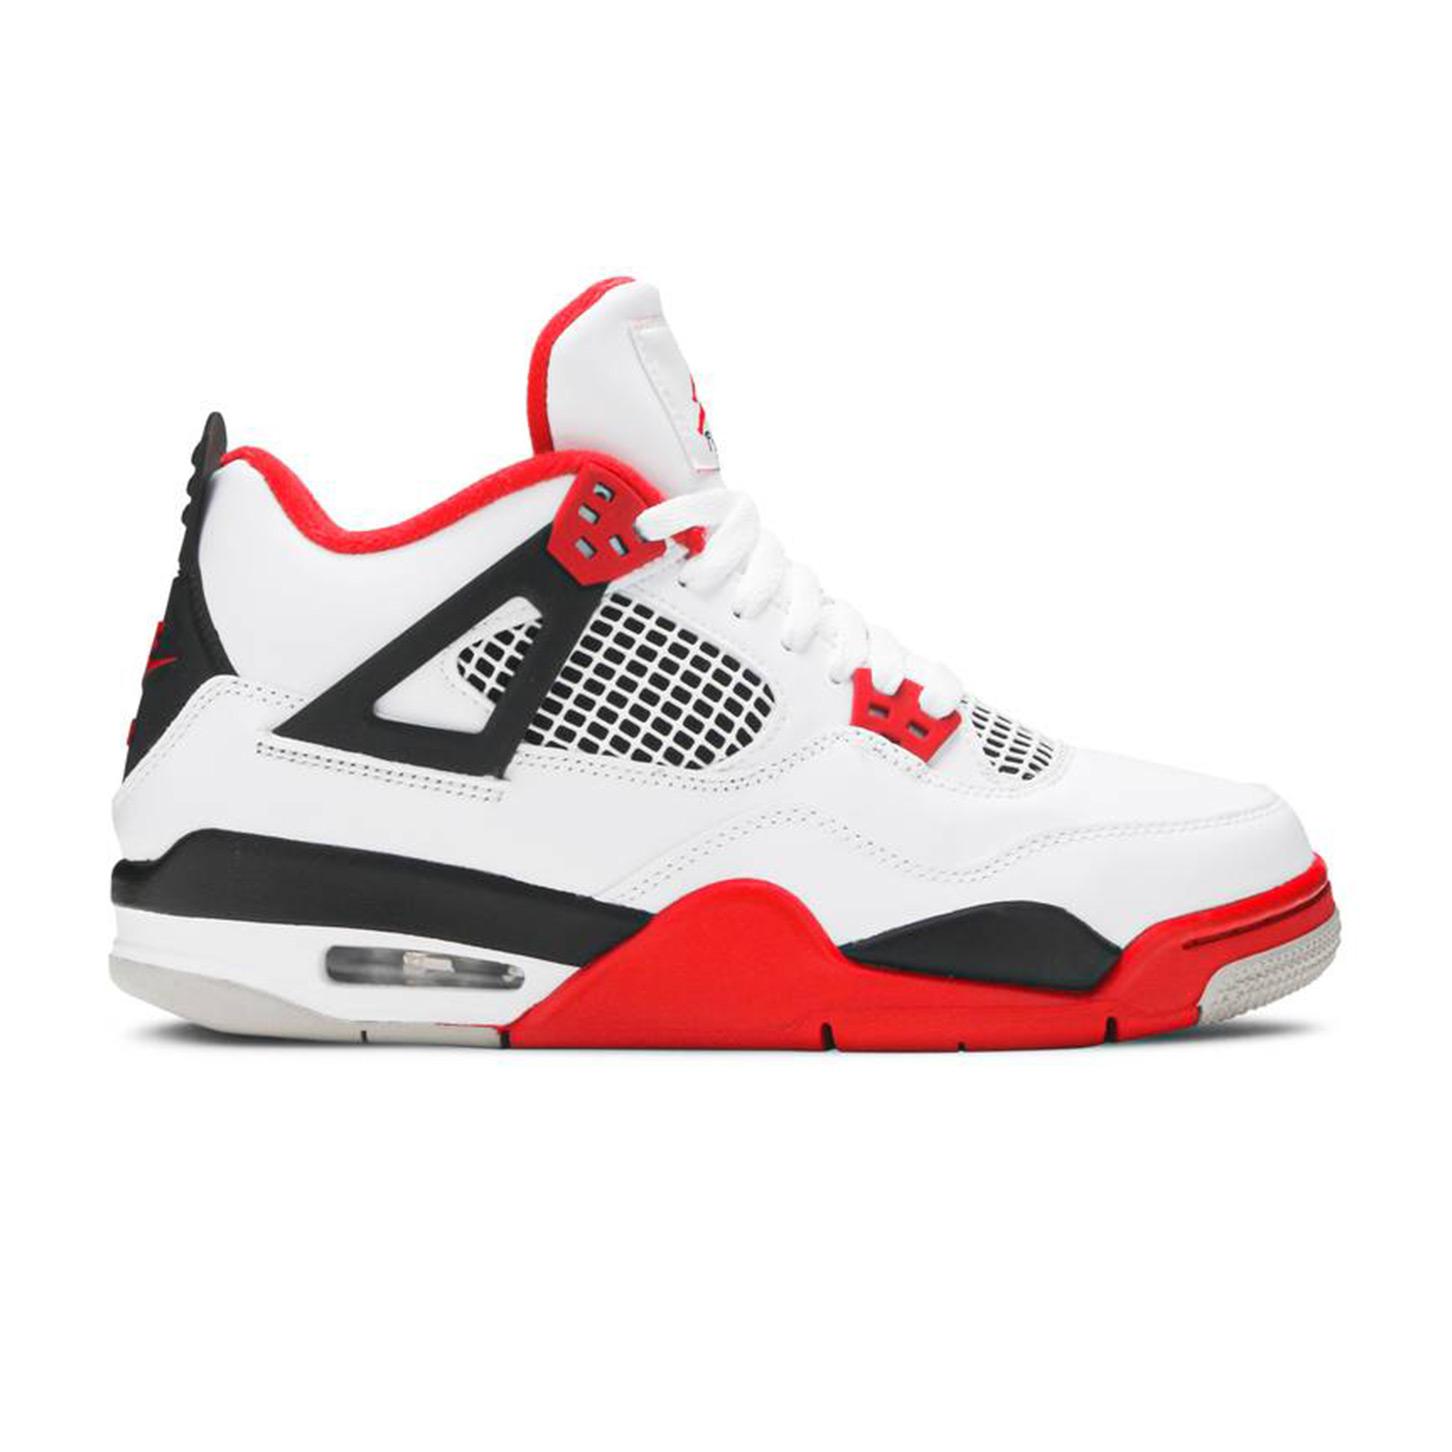 Jordan 4 Retro Fire Red 2020 (GS)